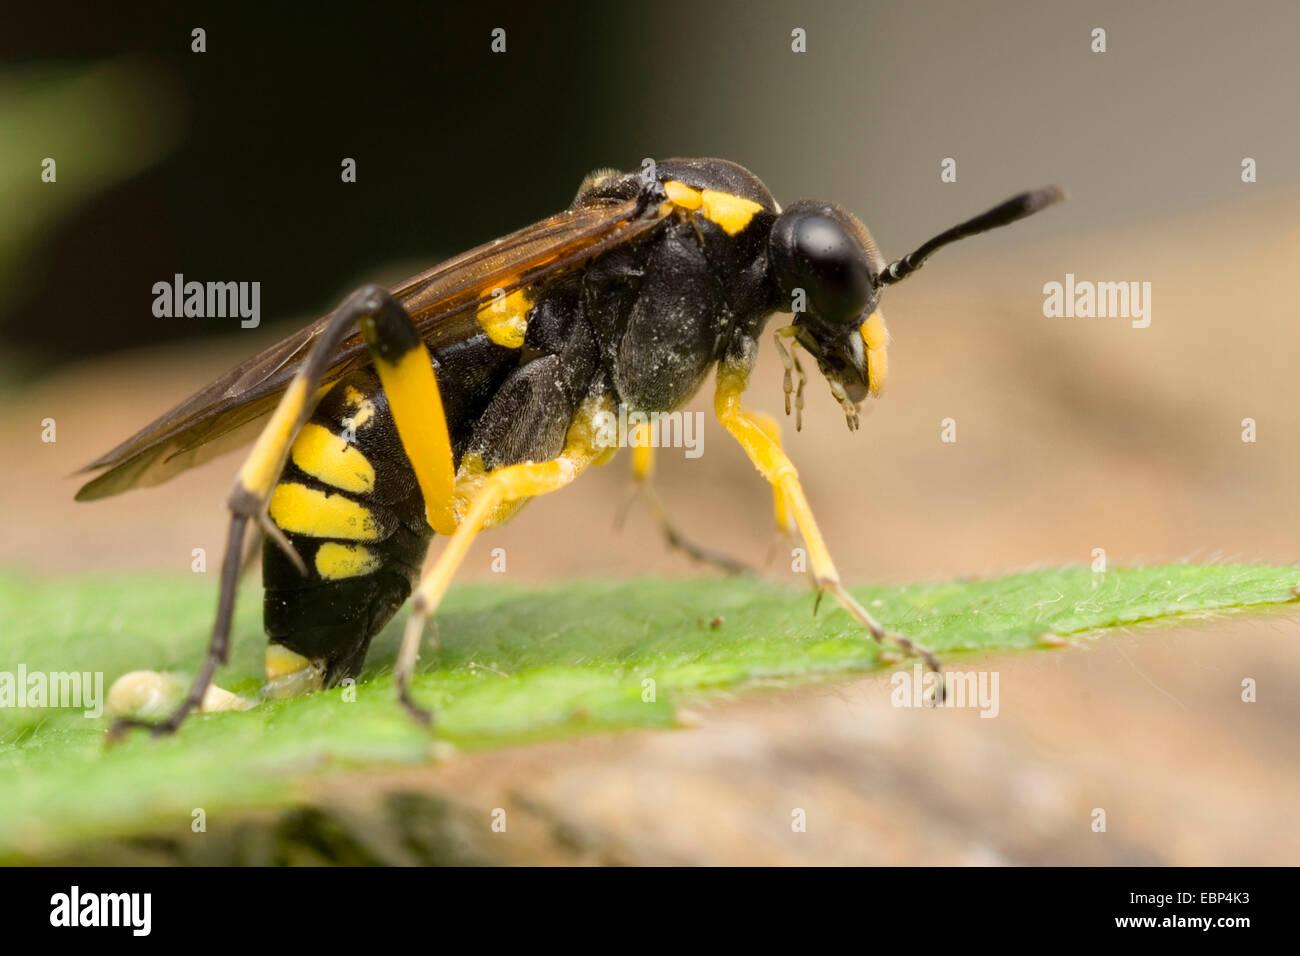 Blattwespen (Macrophya Montana), Eiablage, Deutschland Stockbild